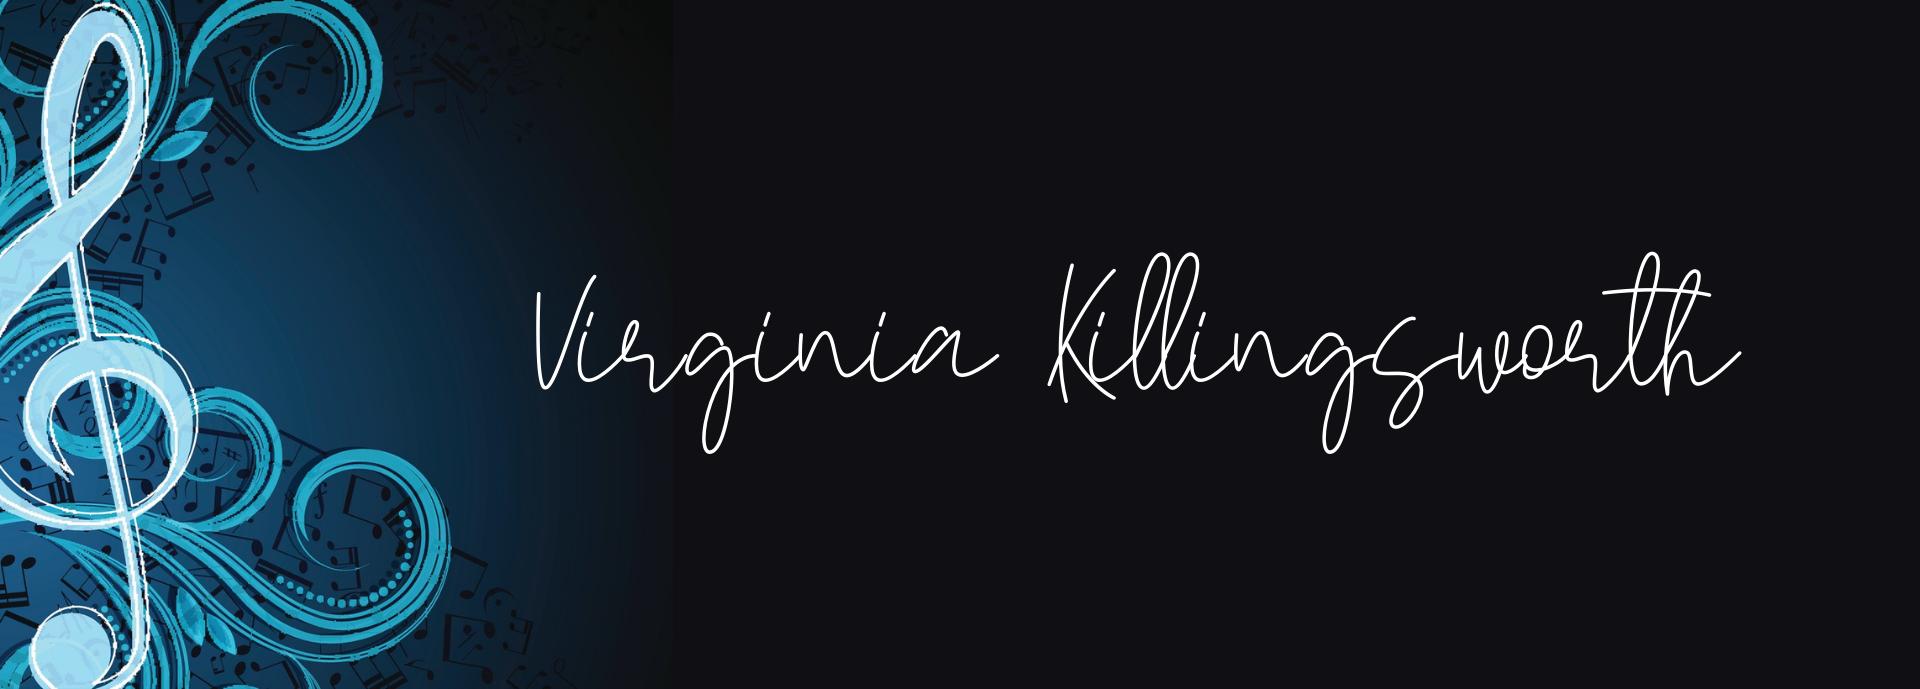 Virginia Killingsworth